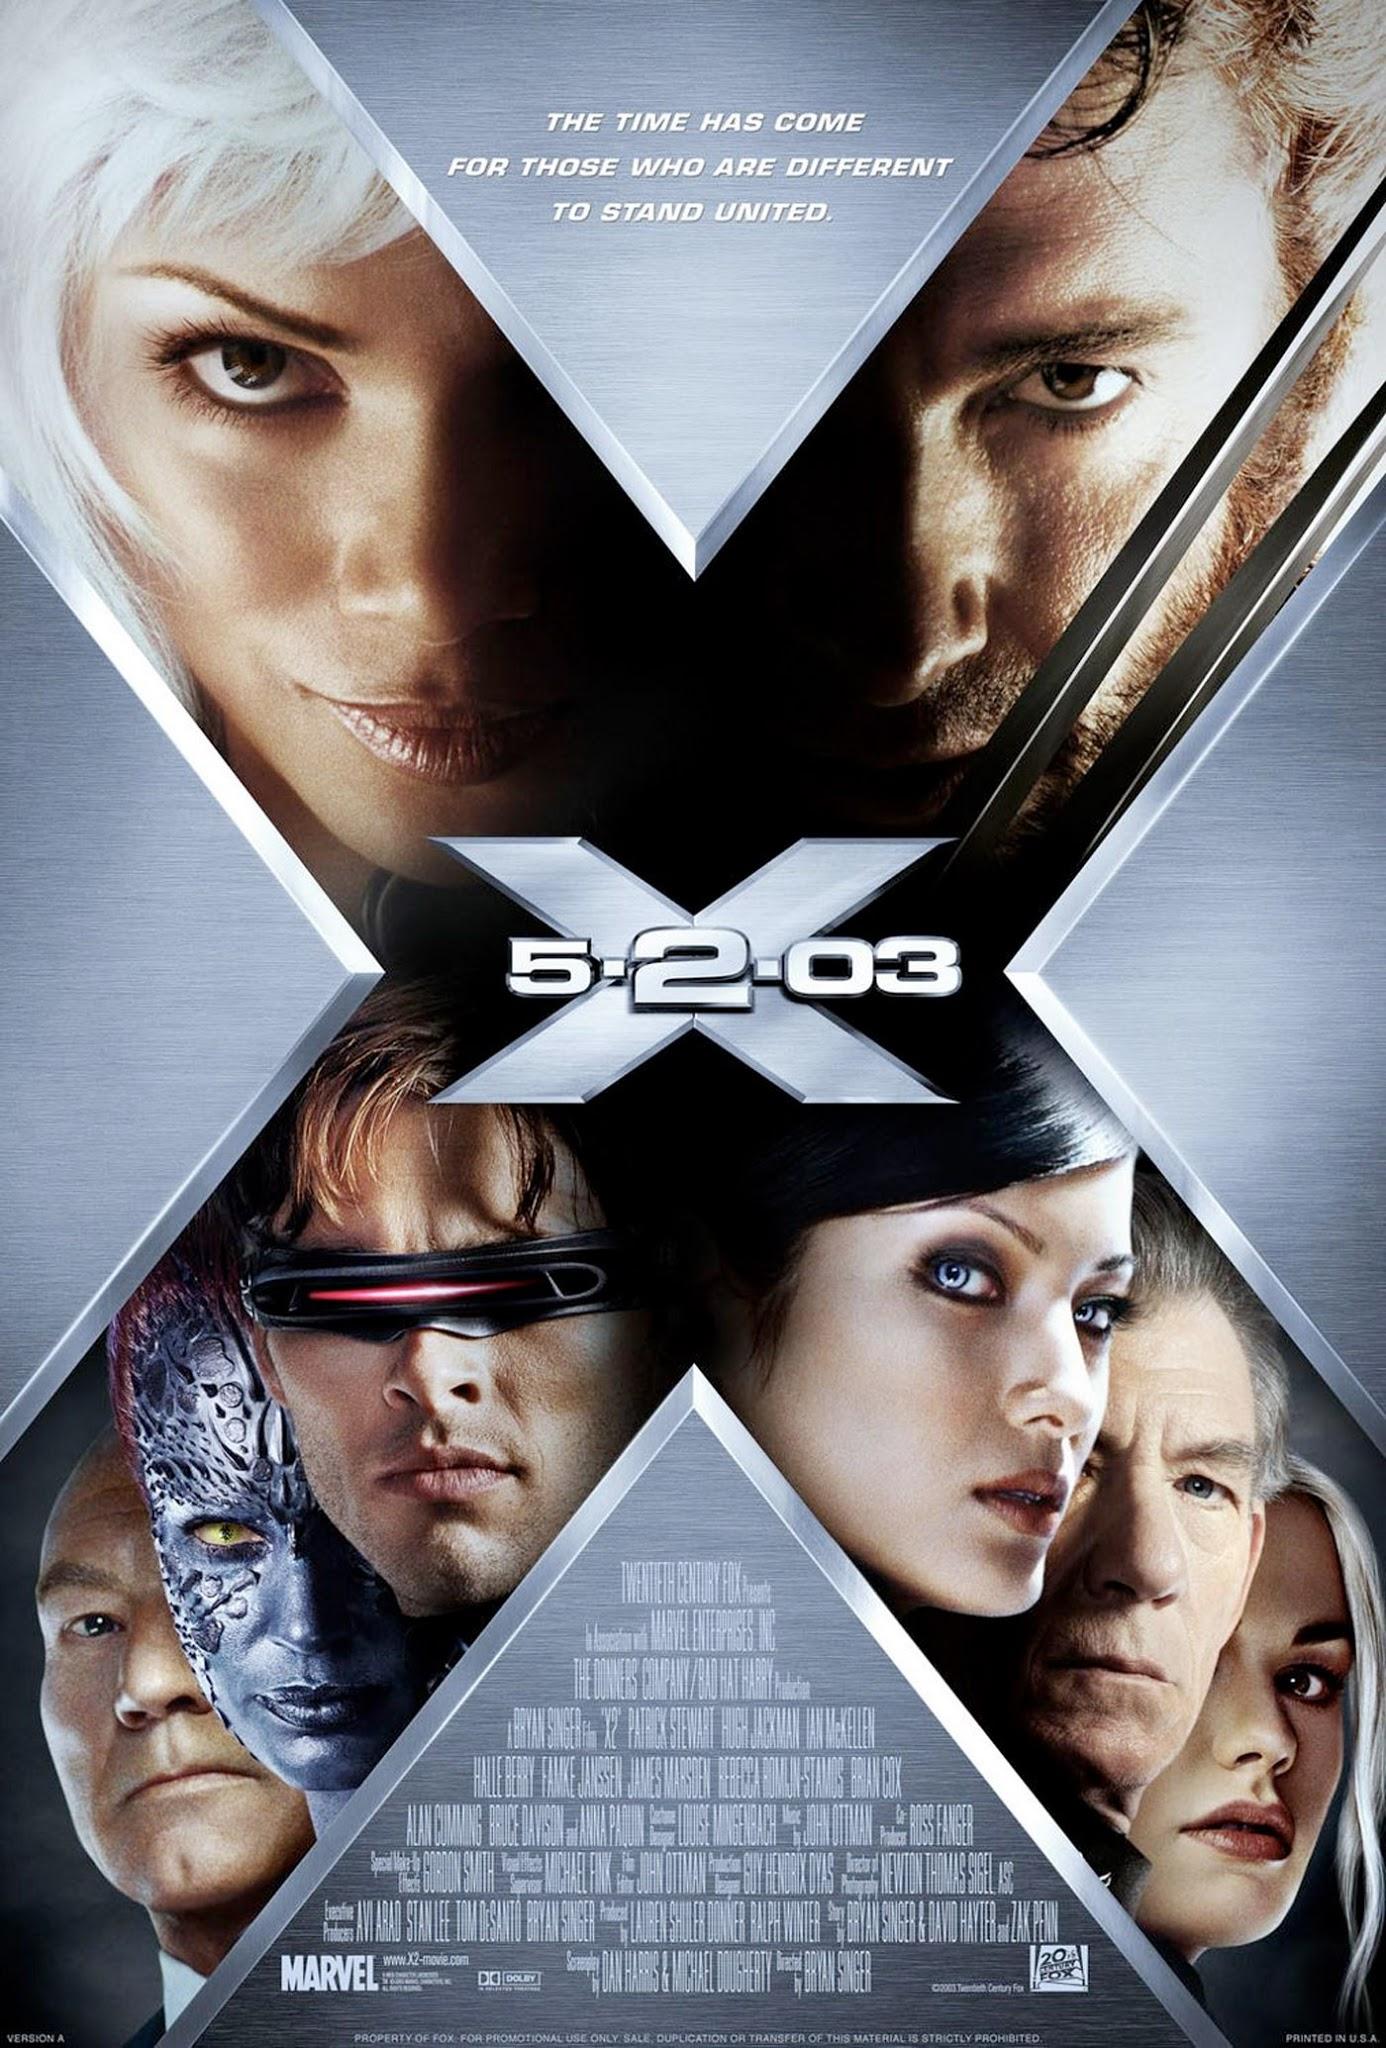 x-men 2 film recenzja wolverine magneto mystique